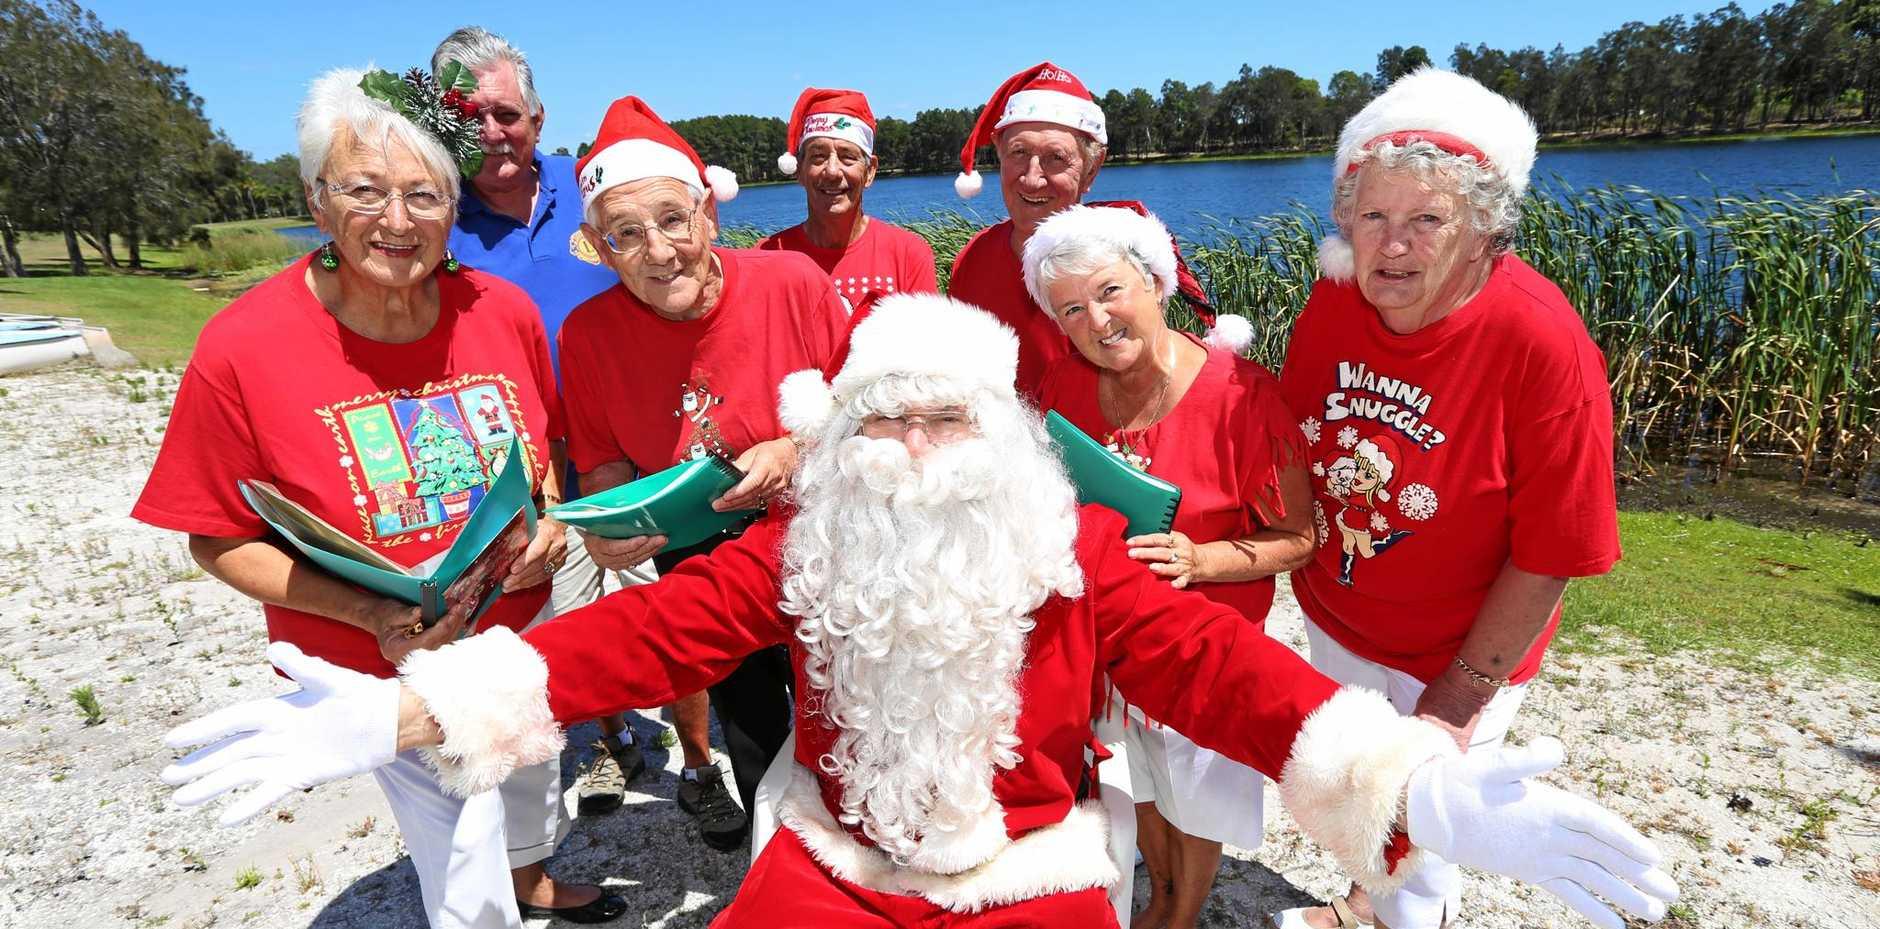 Kingscliff Chrismas Carols - Des Lund, Colin Lacey, Geoff Dart, Sheila Patterson, Joan Rice, Alan McCarthy, Sandy Brand